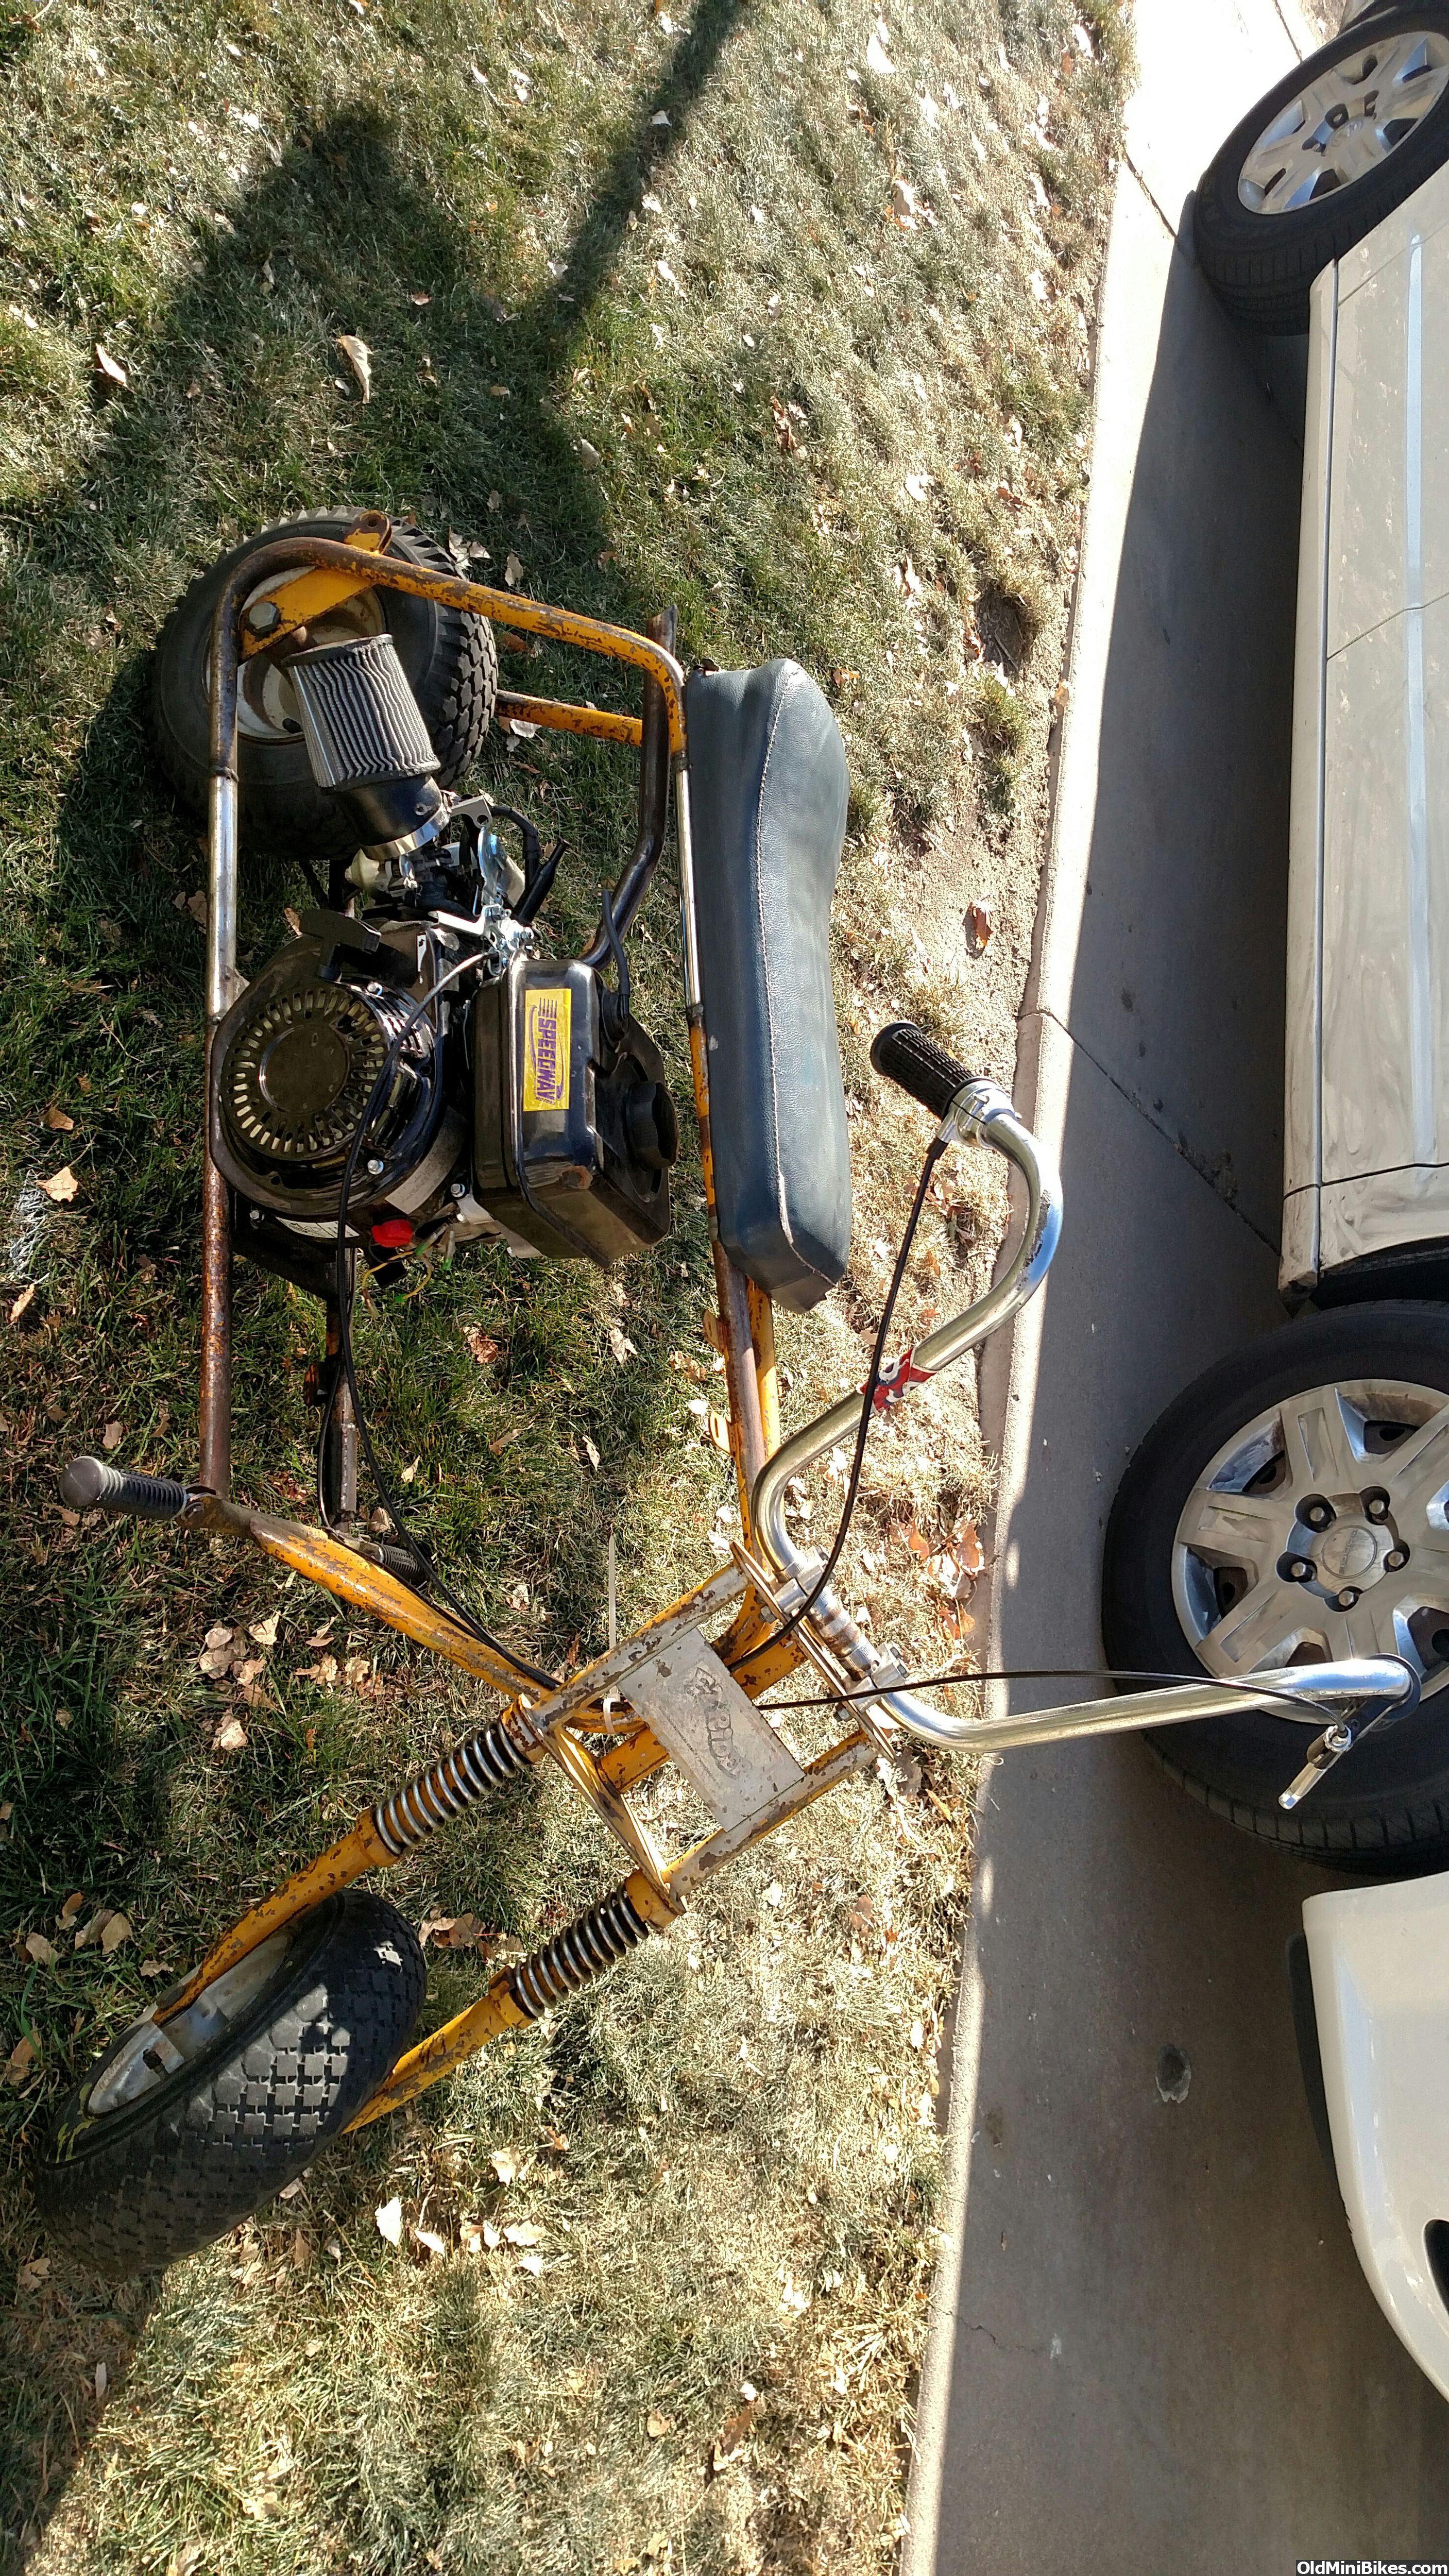 Mini Bike Seat Shocks : In search of original arco easyrider suspension seat and